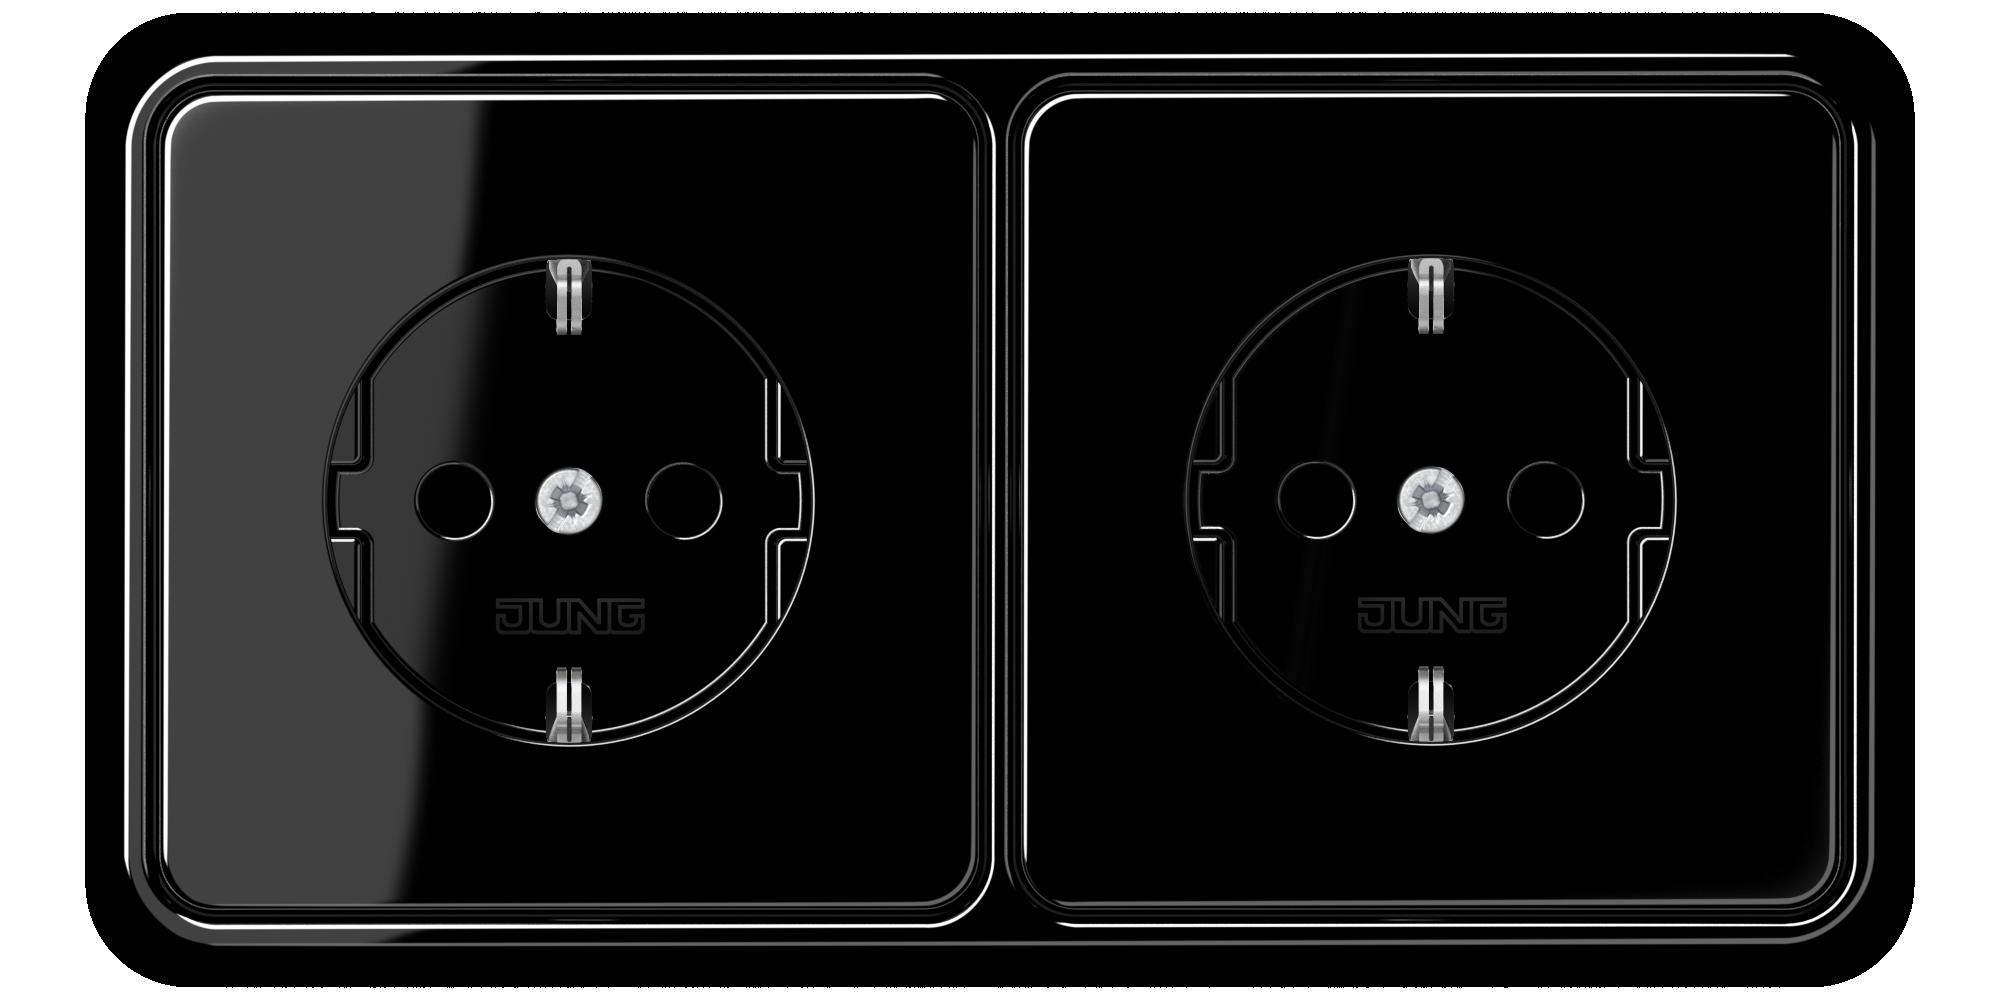 JUNG_CD500_black_socket-socket_H